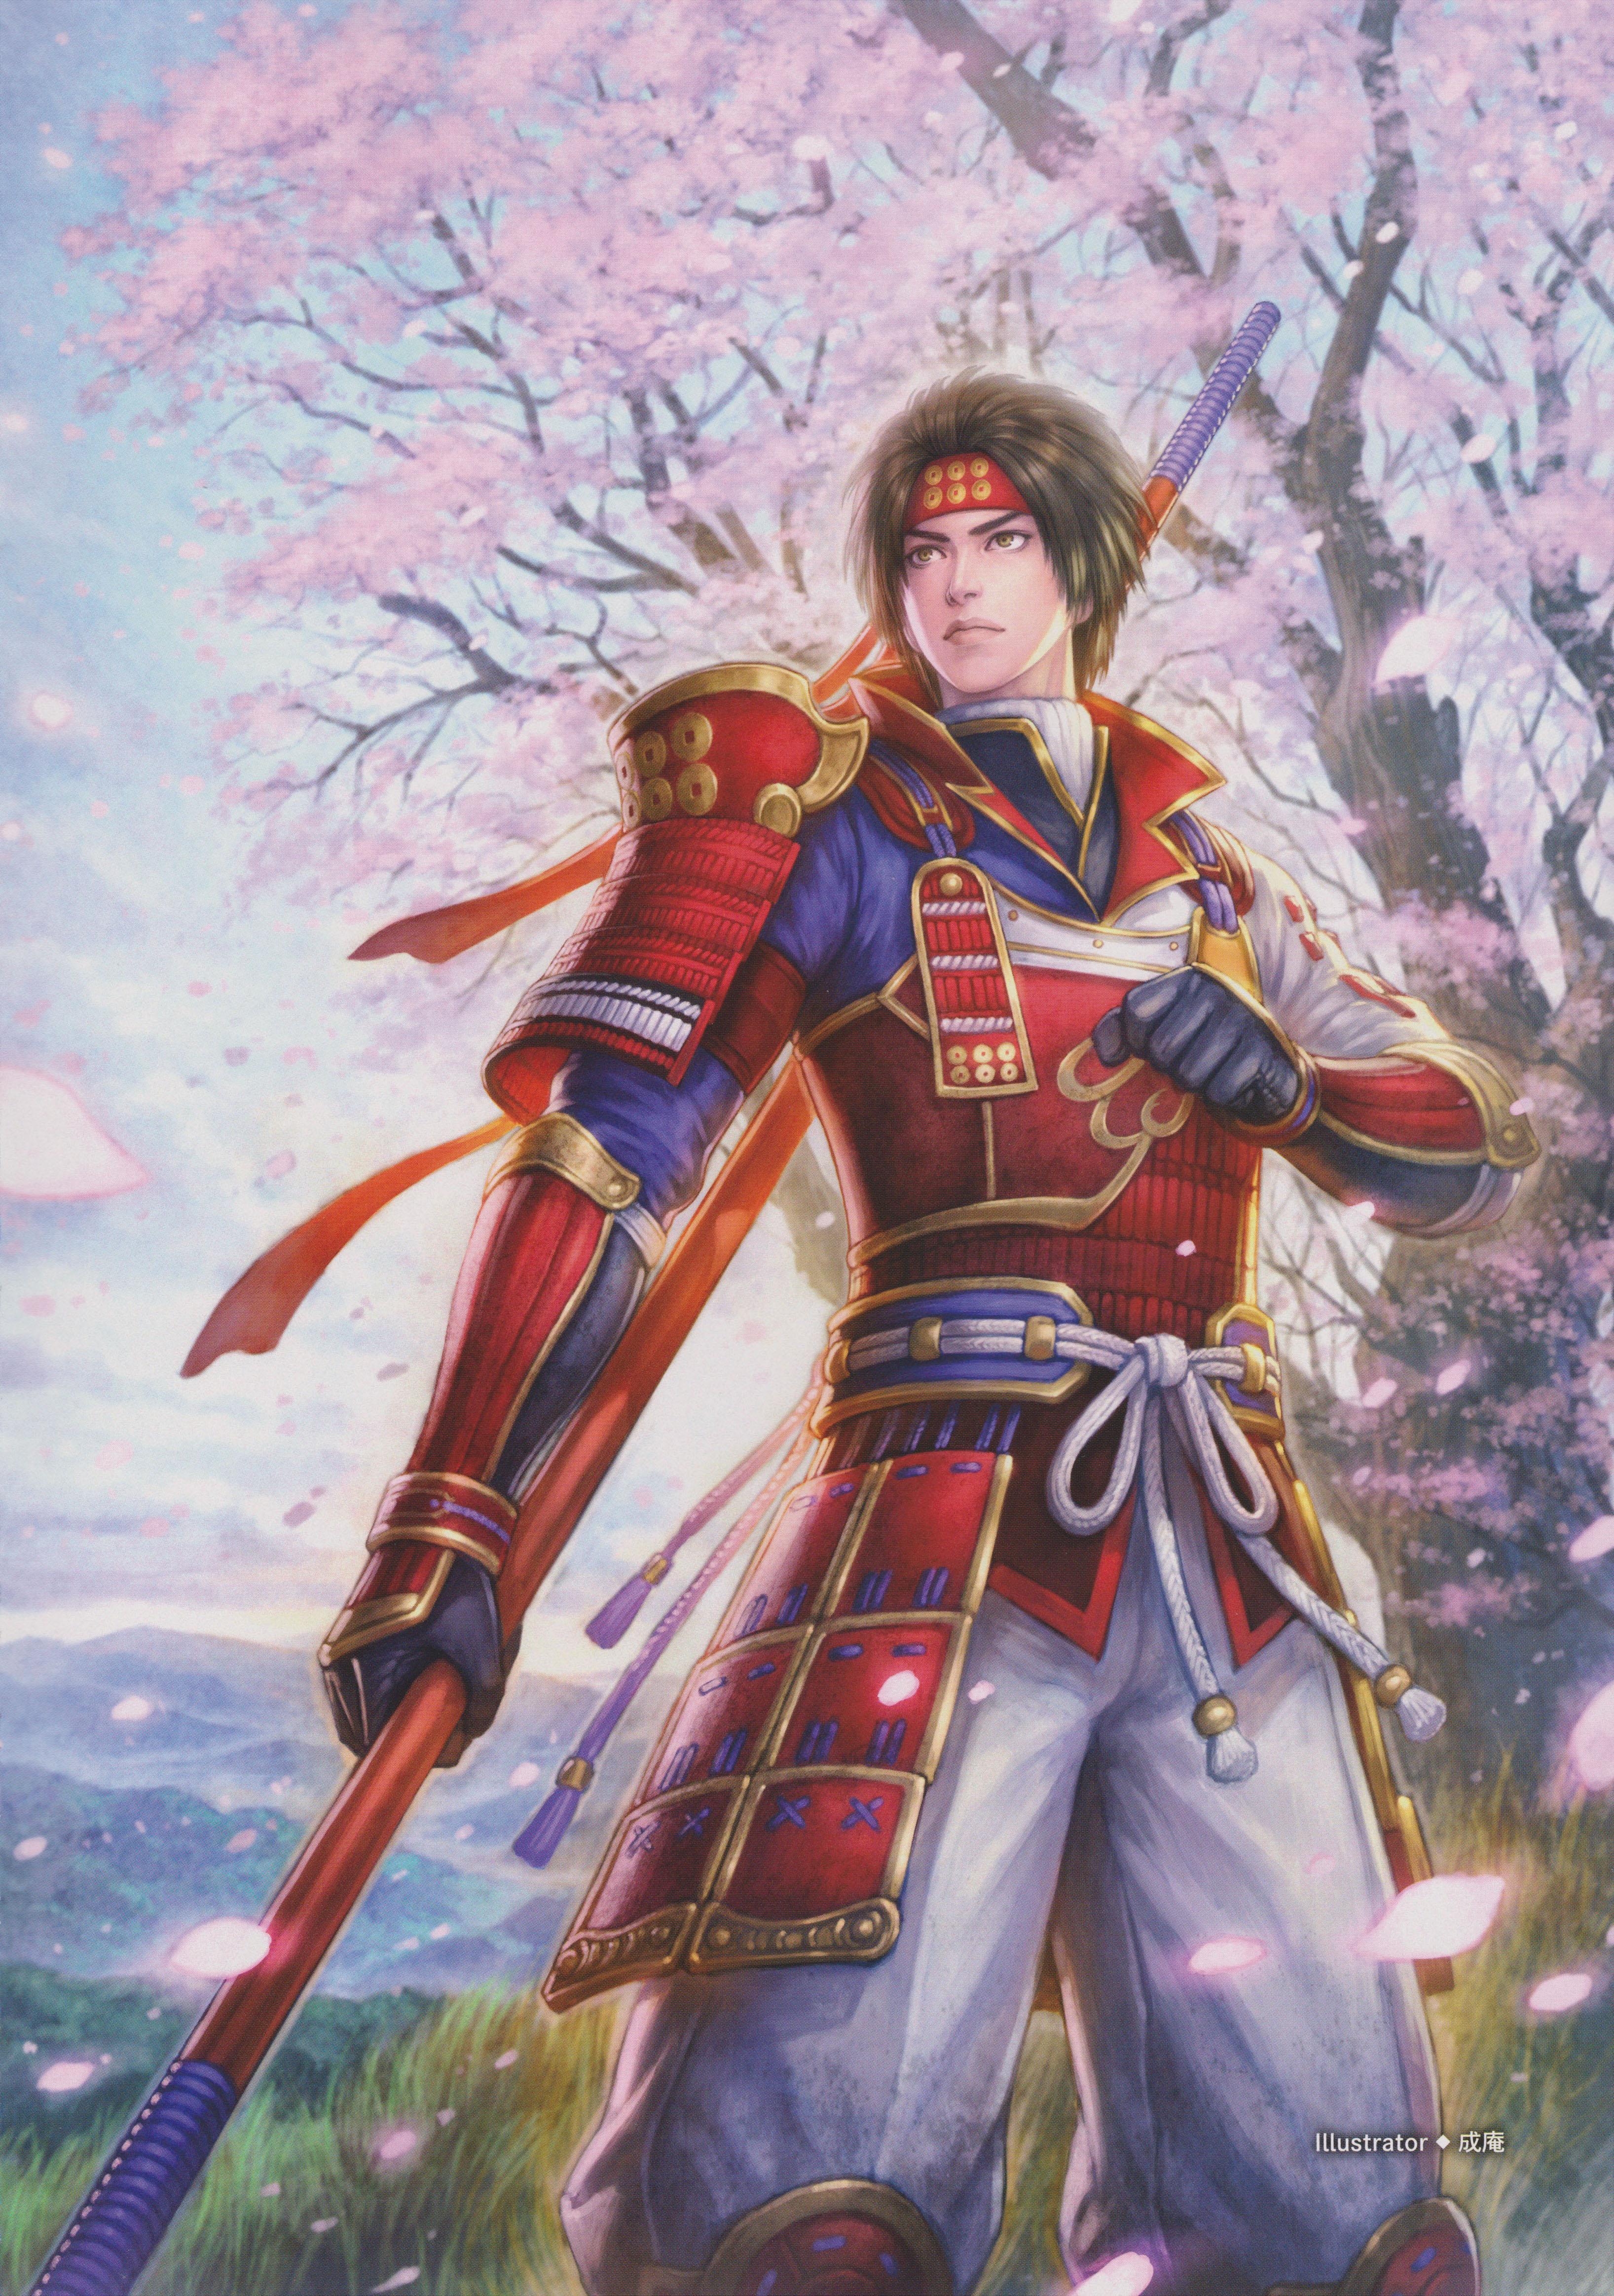 Yukimura Sanada (Koei)